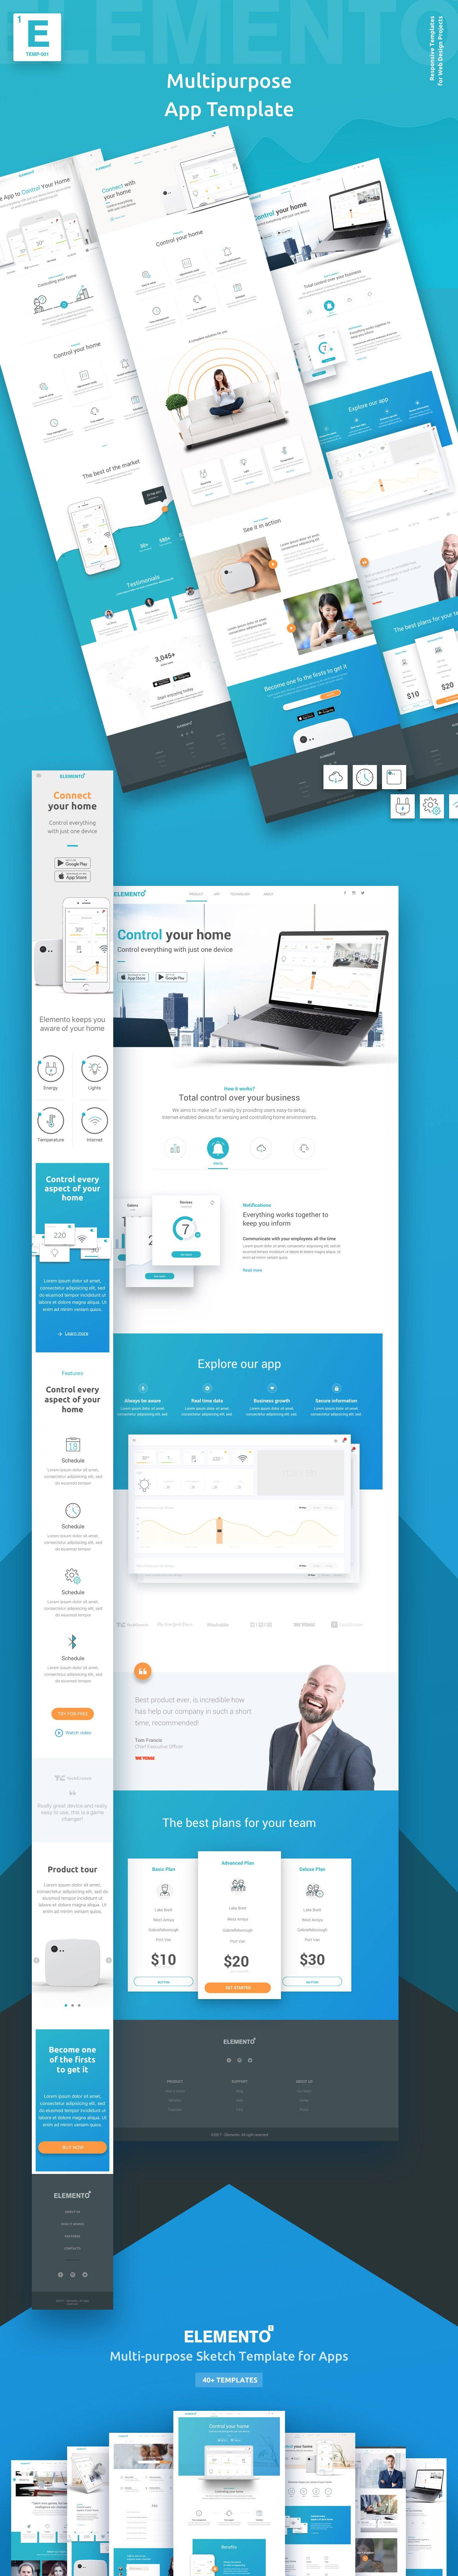 Elemento企业服务网页模板.sketch素材下载 网页模板-第1张